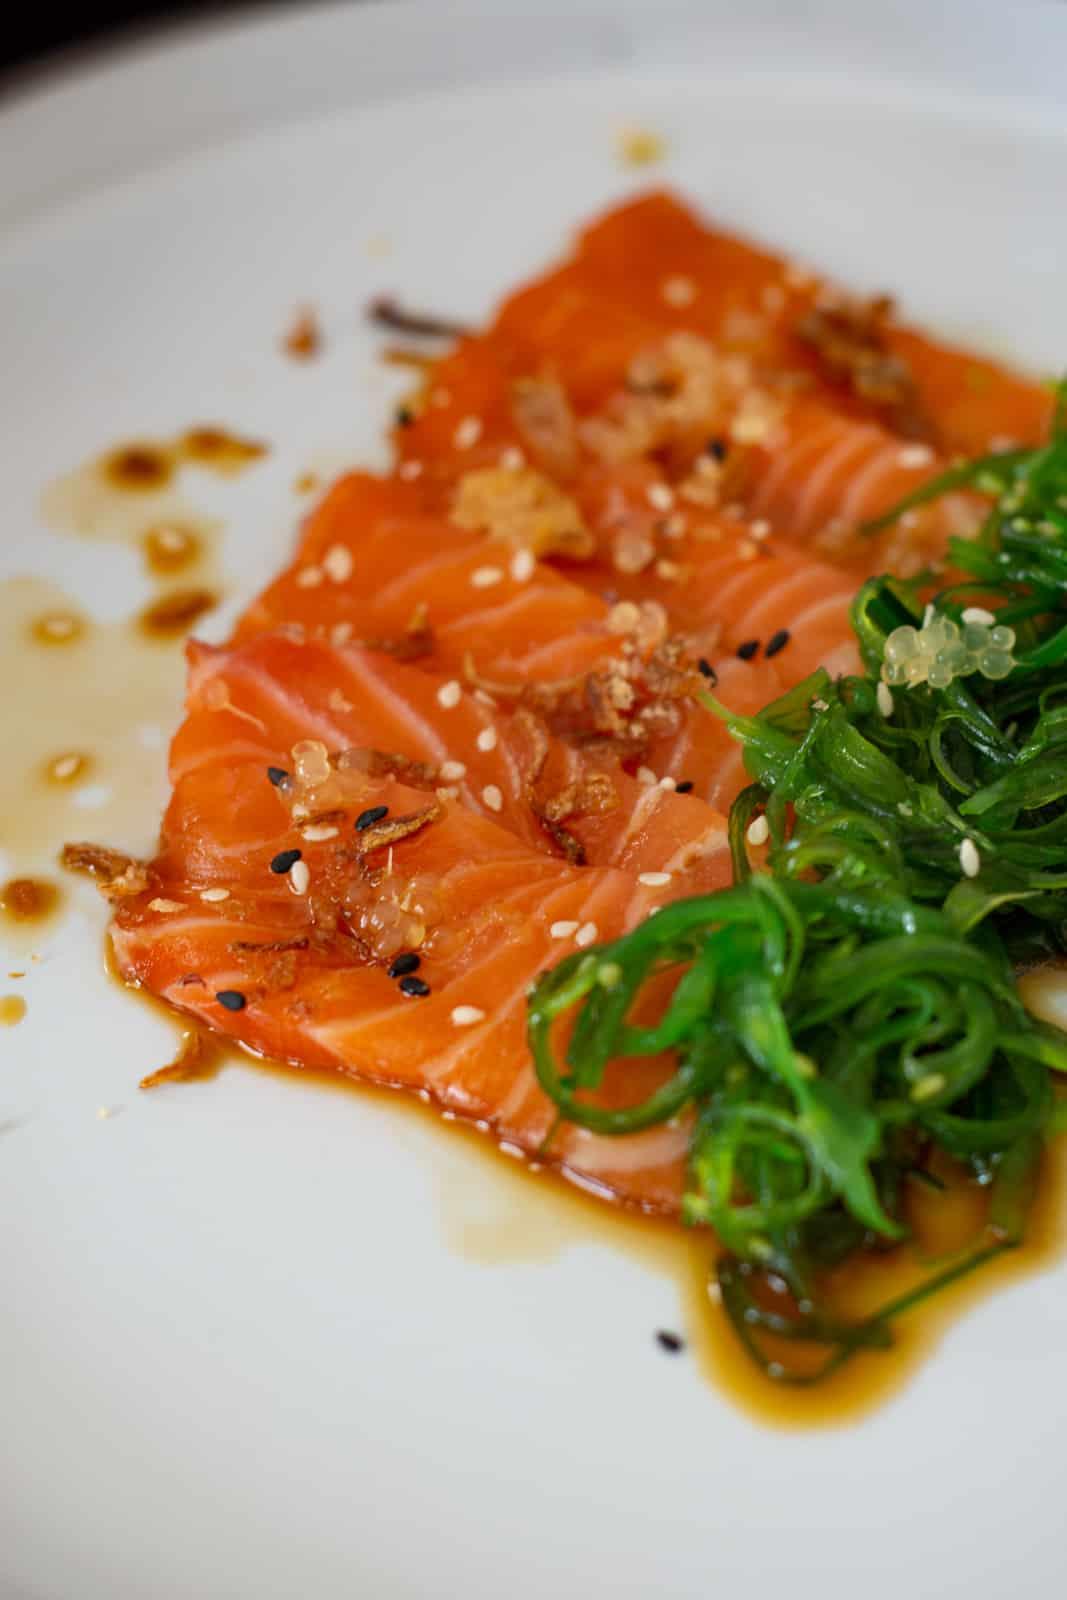 close up of salmon crudo w/ ponzu sauce & wakame on a white plate